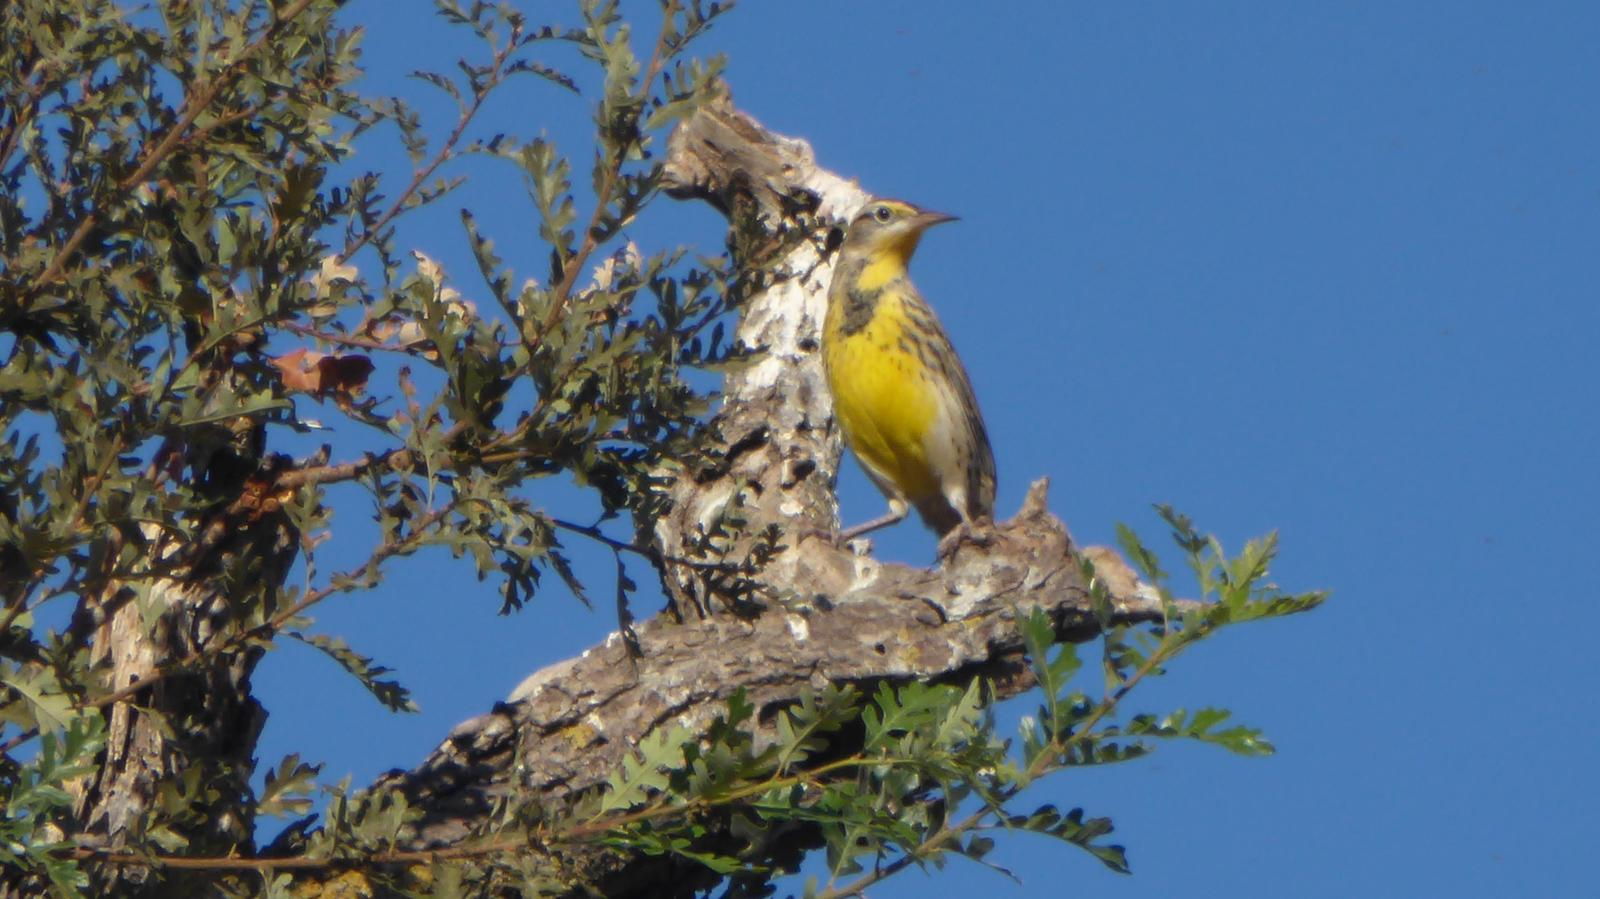 Western Meadowlark Photo by Daliel Leite